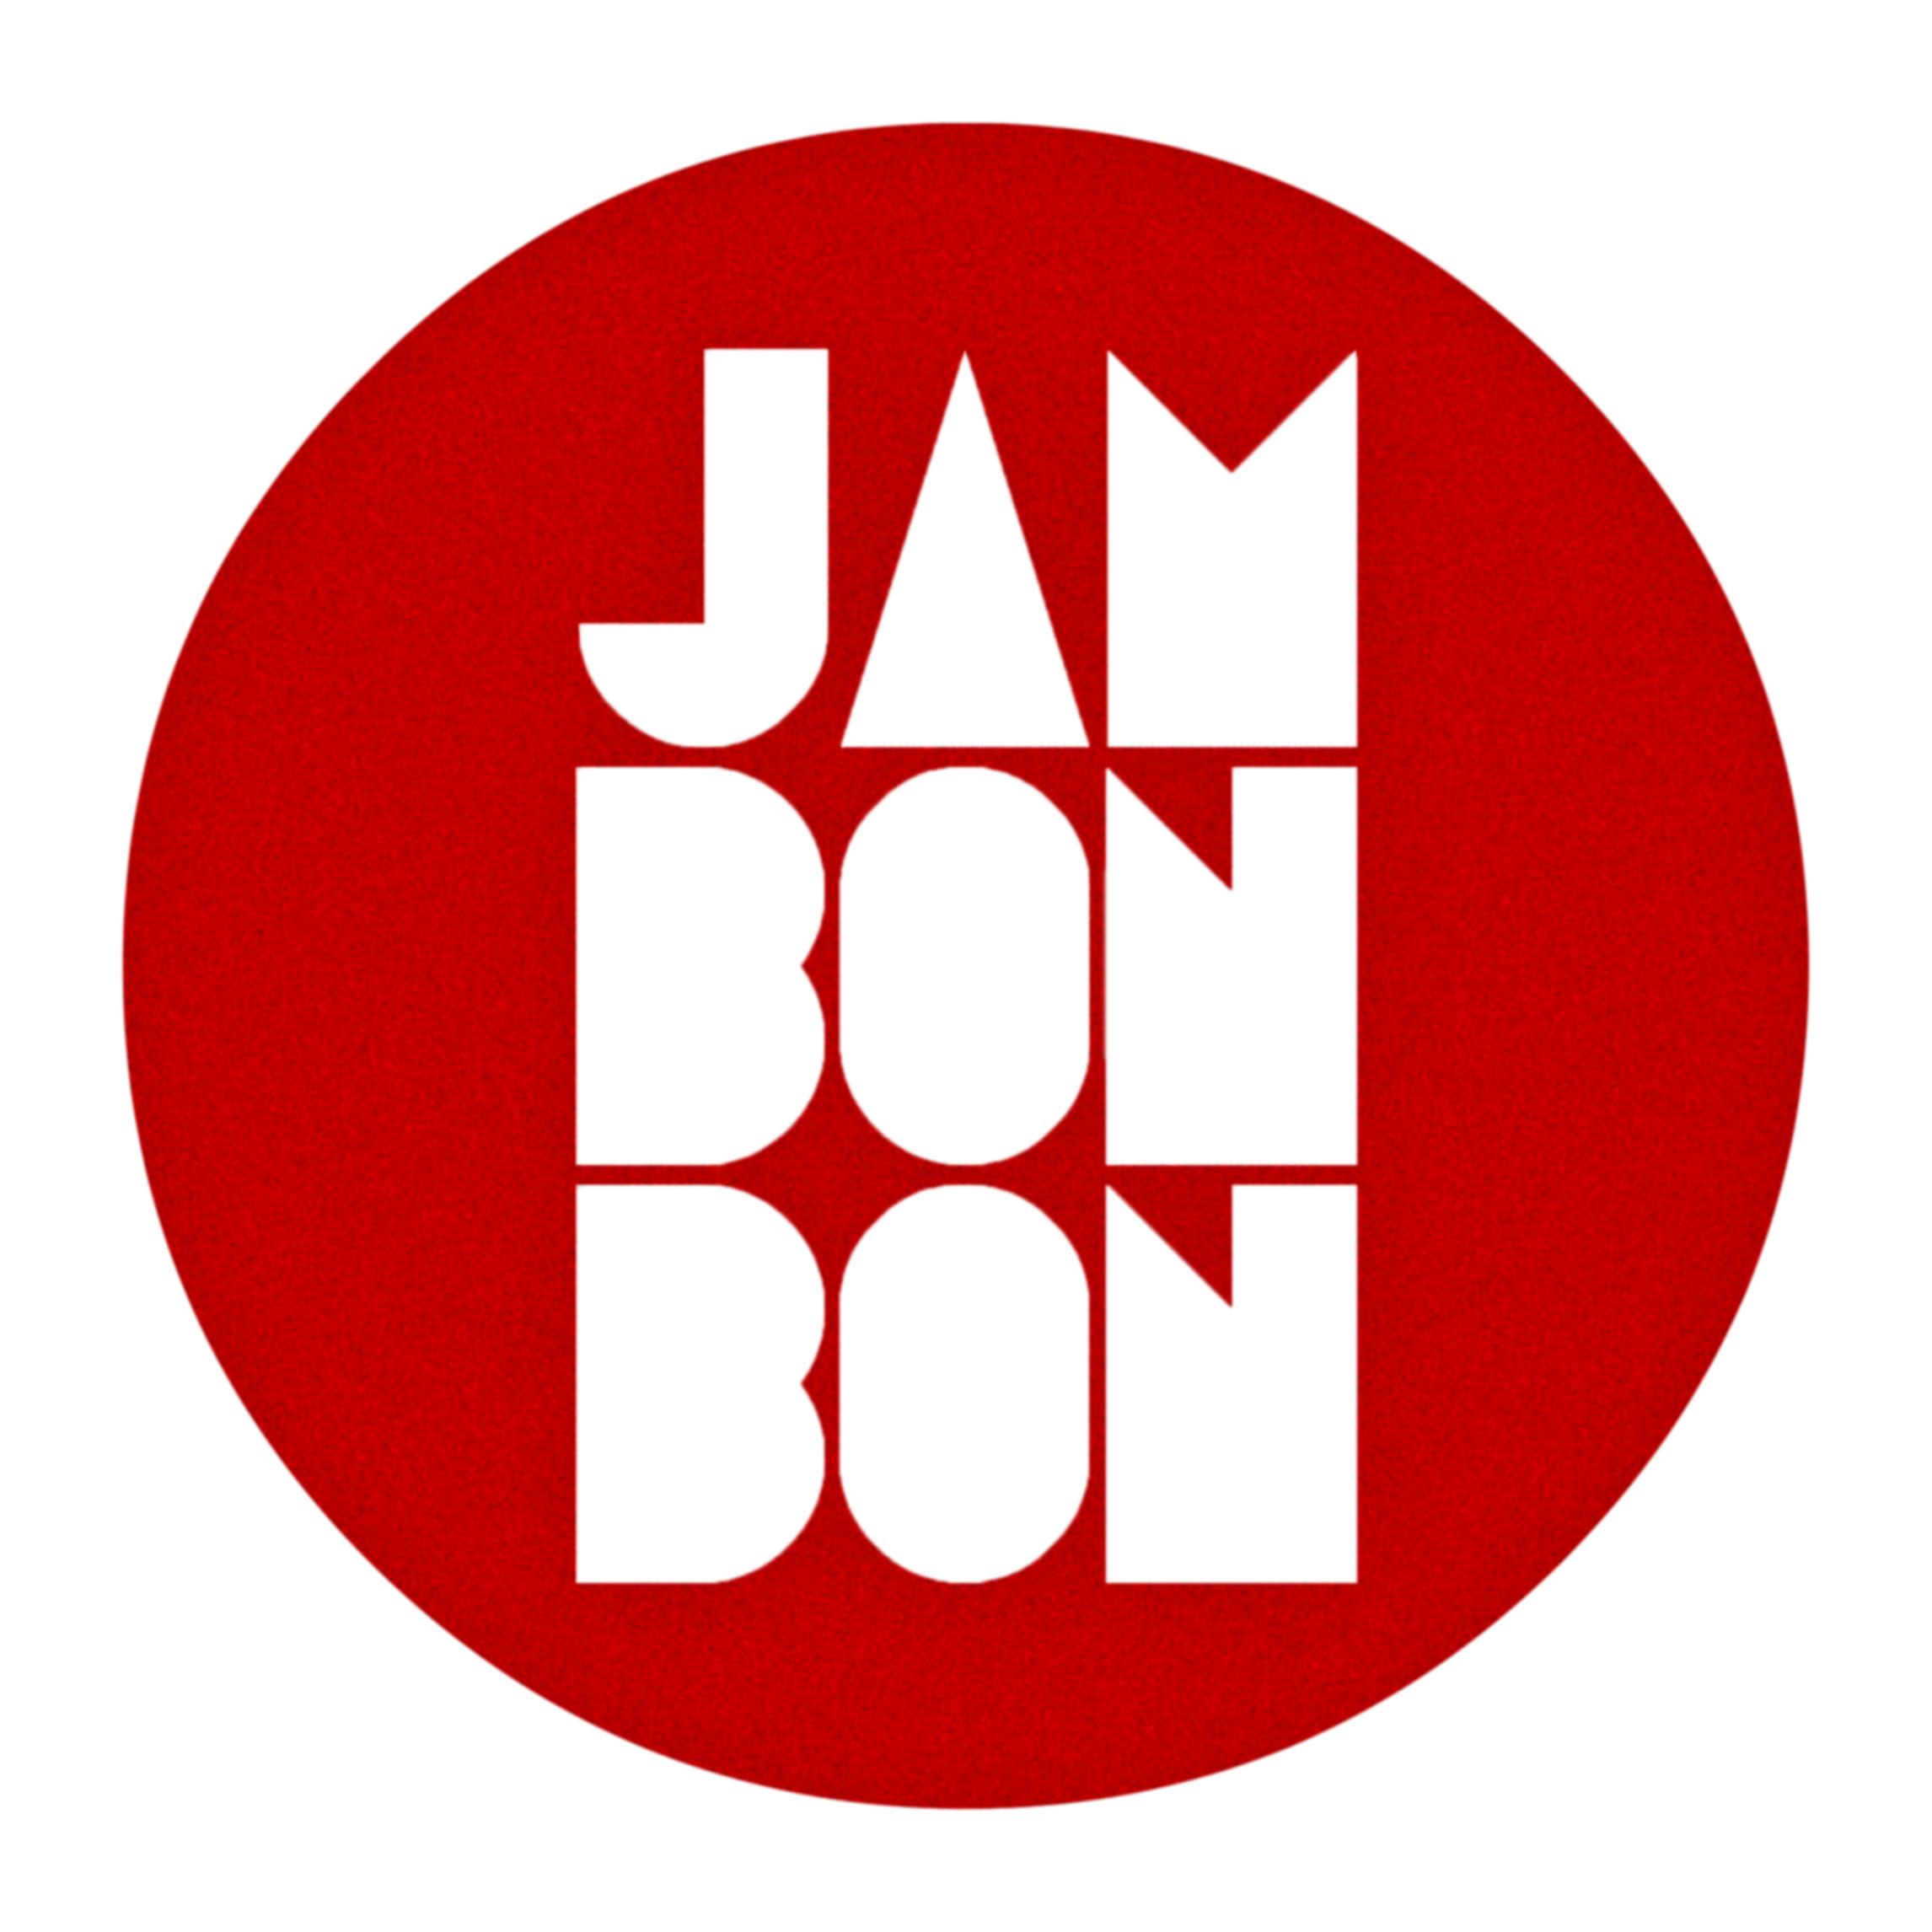 JAMBONBON